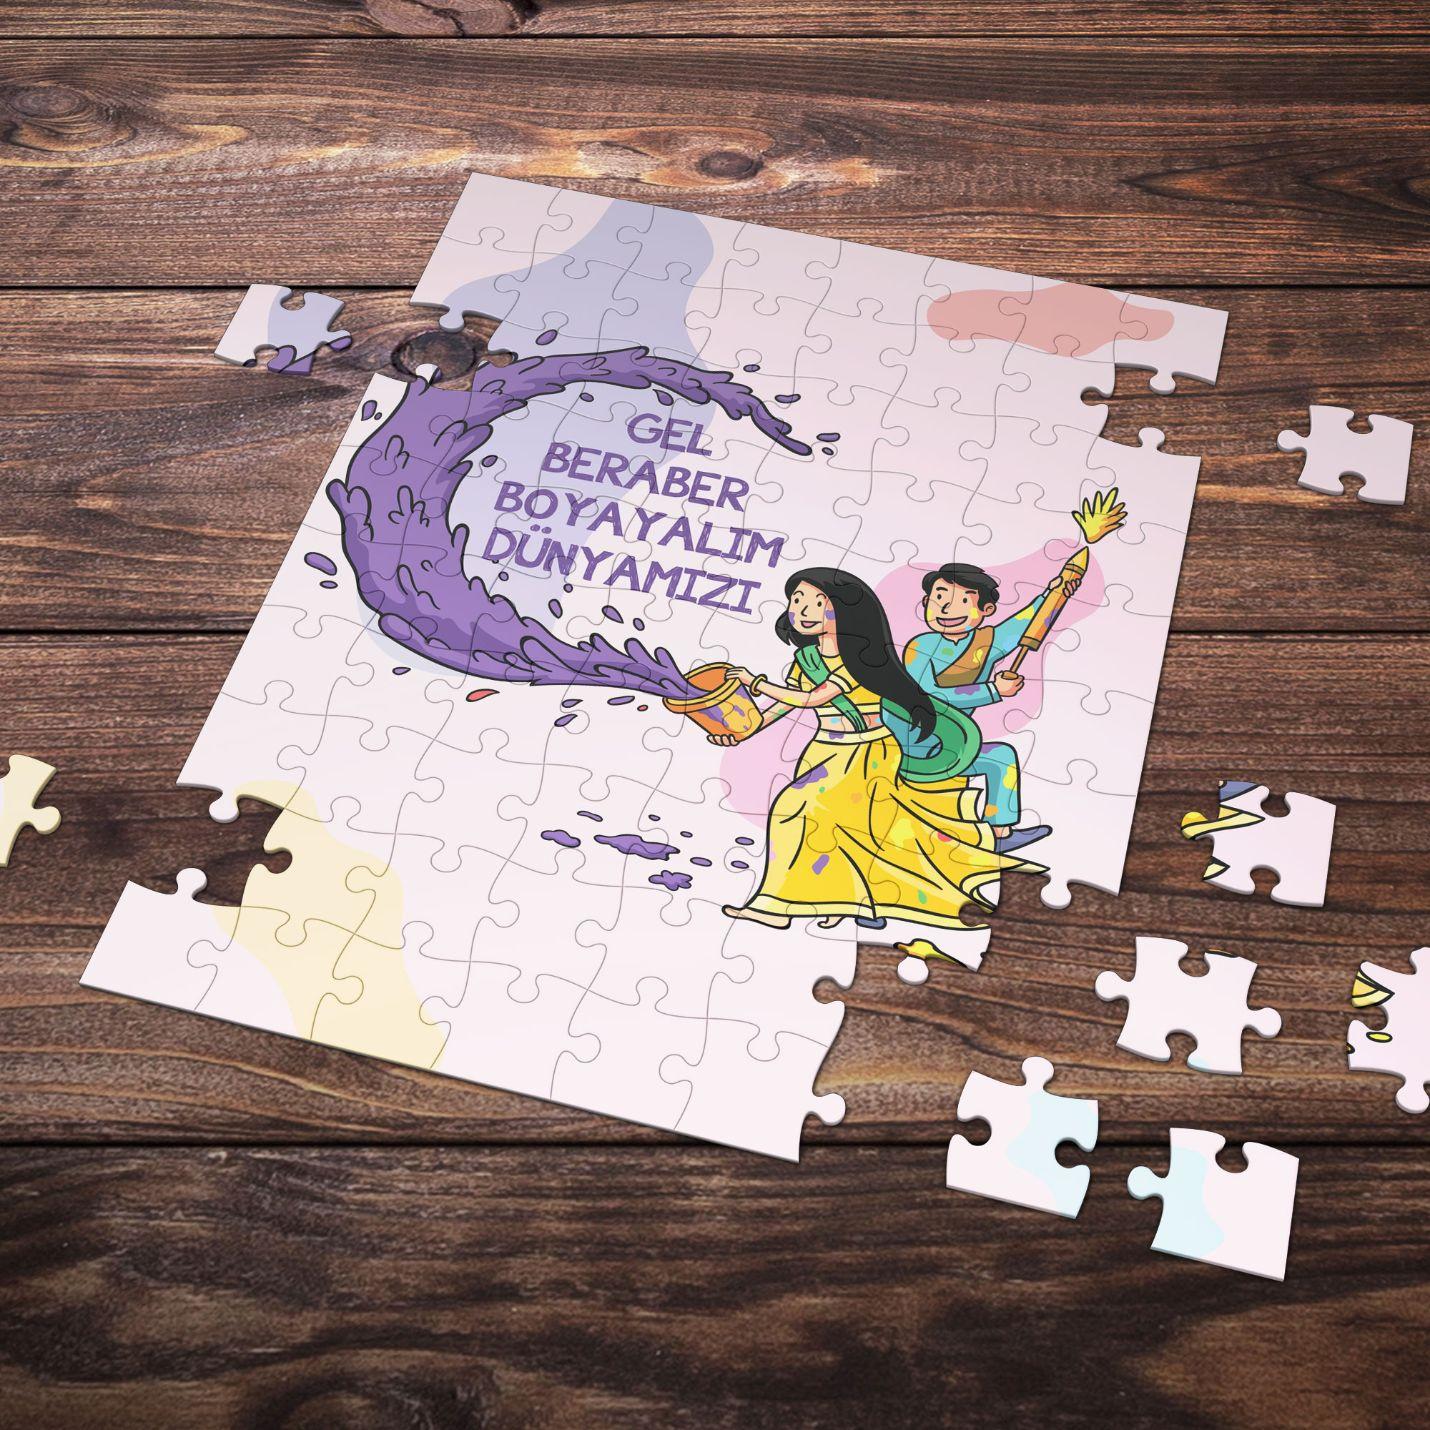 99 Parça Romantik Tasarımlı Puzzle Yapboz No24